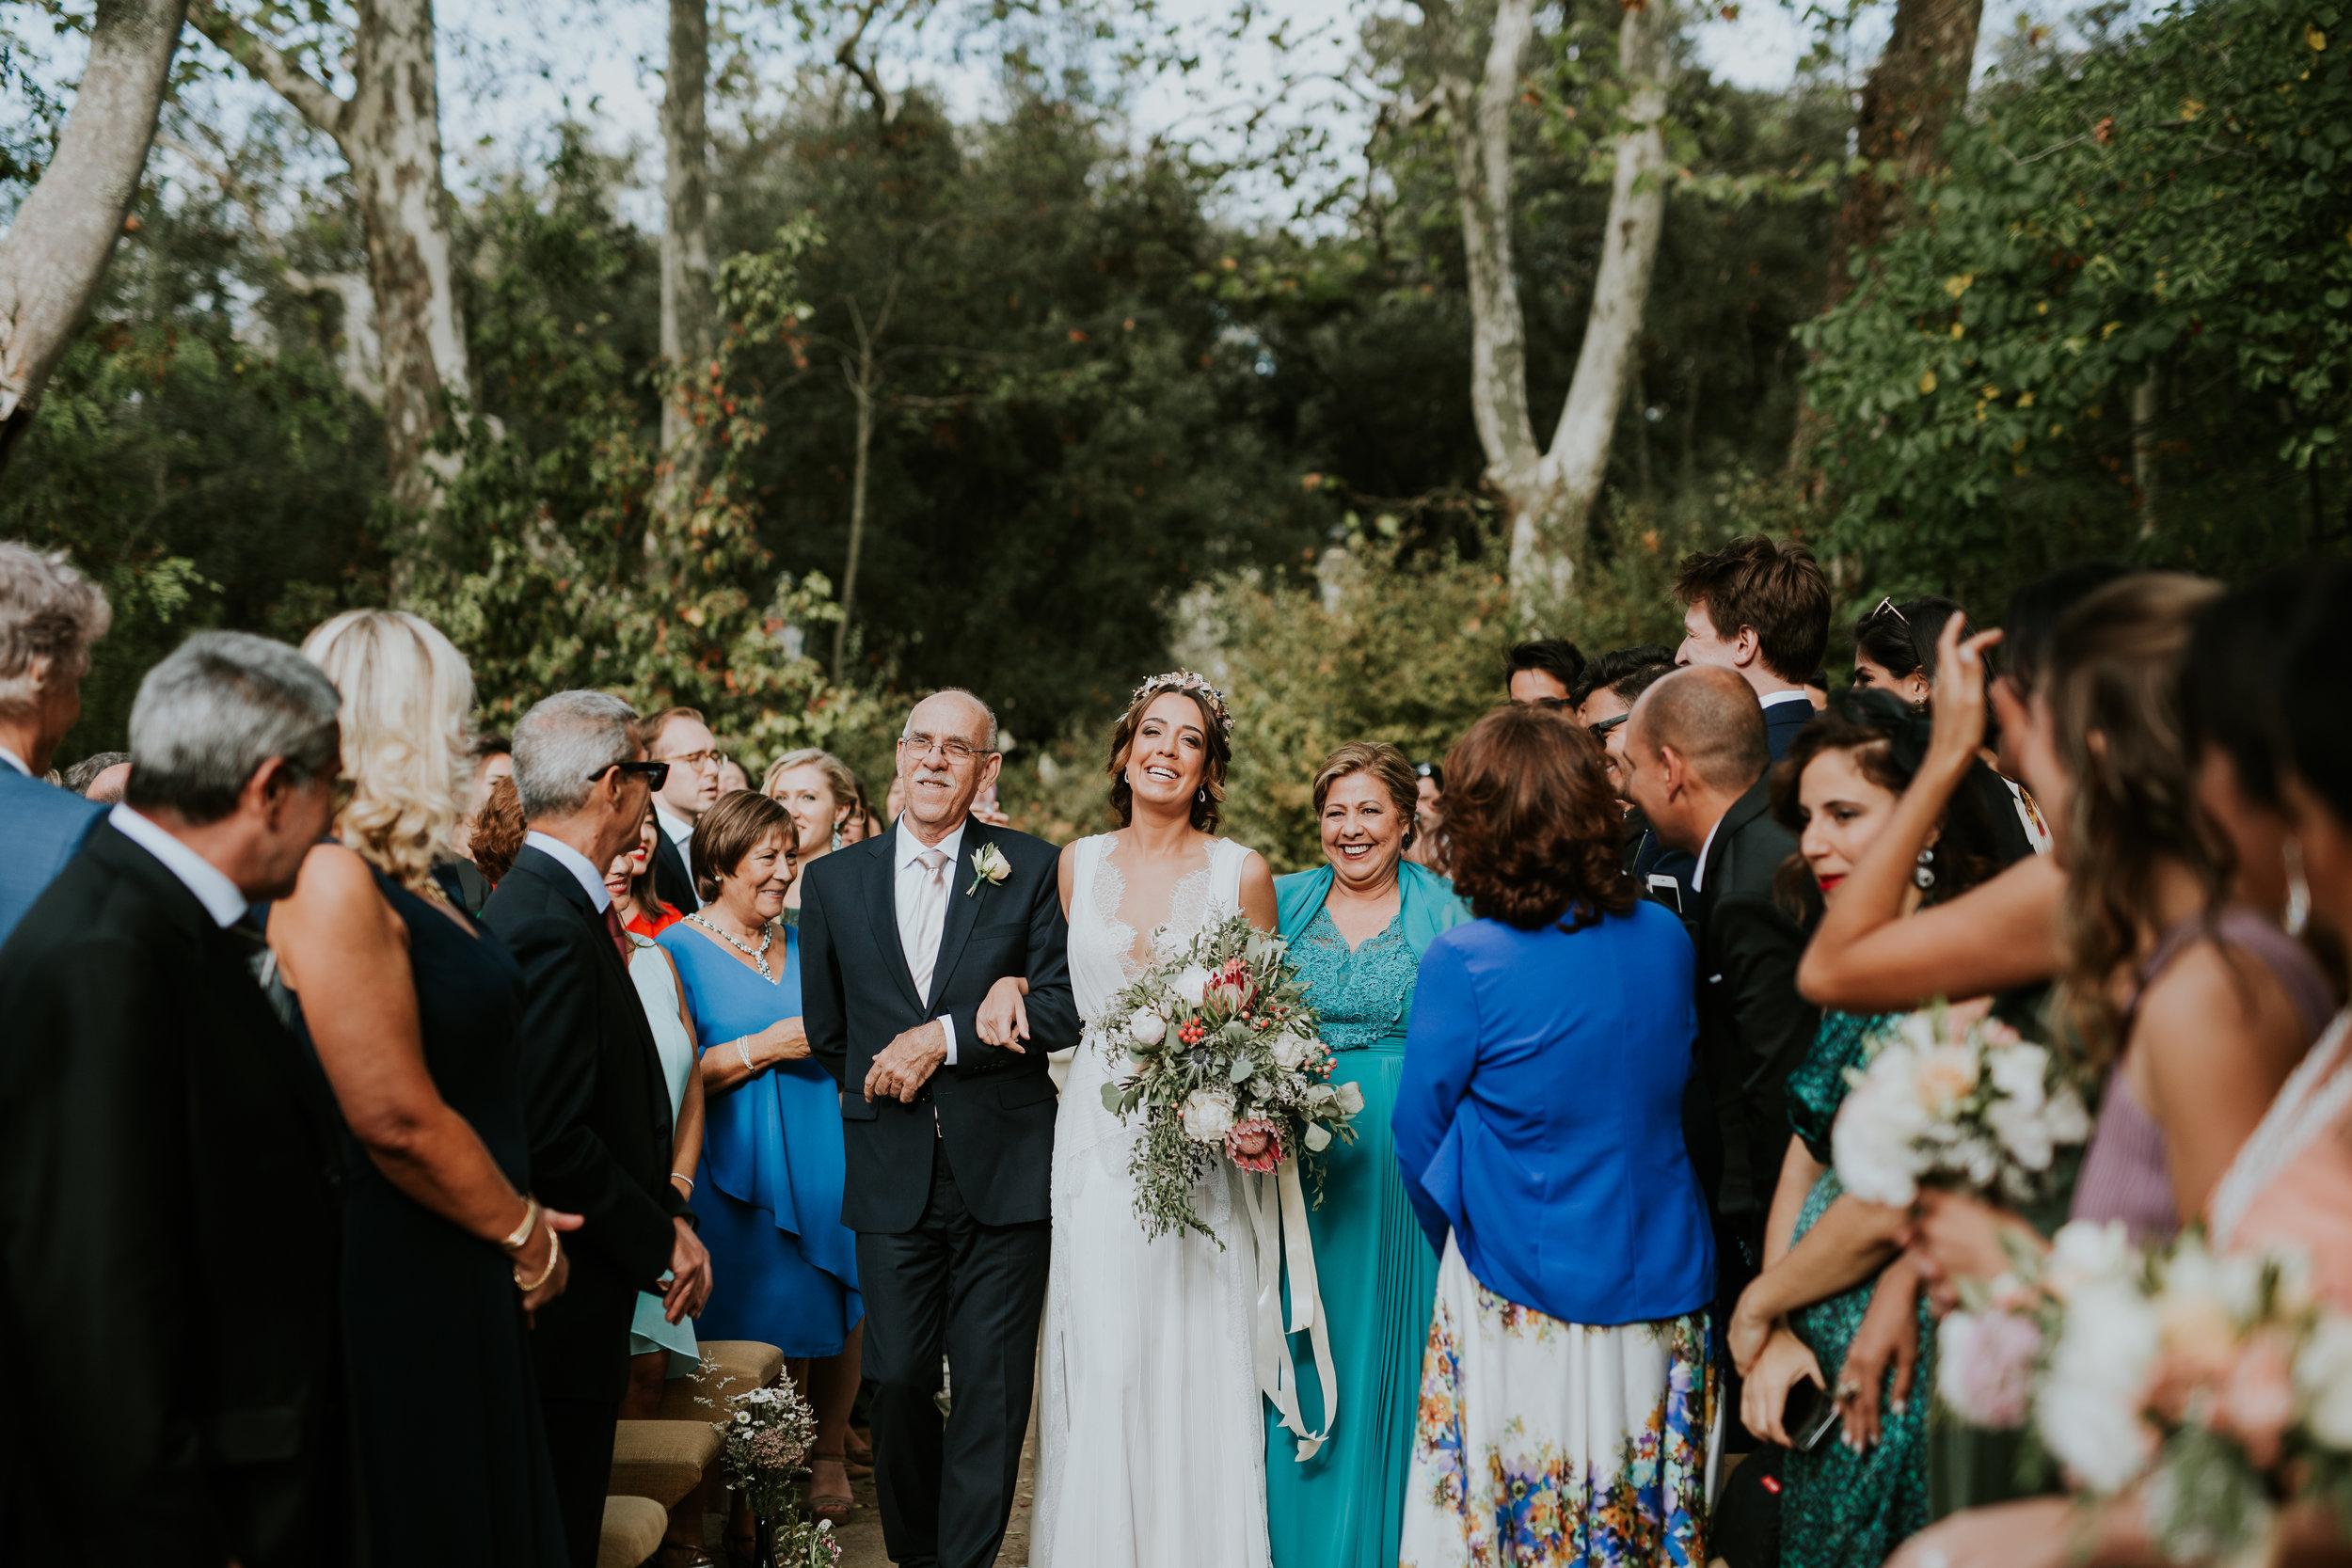 R&J220_ 09 setembro 2017 Wedding day_.jpg